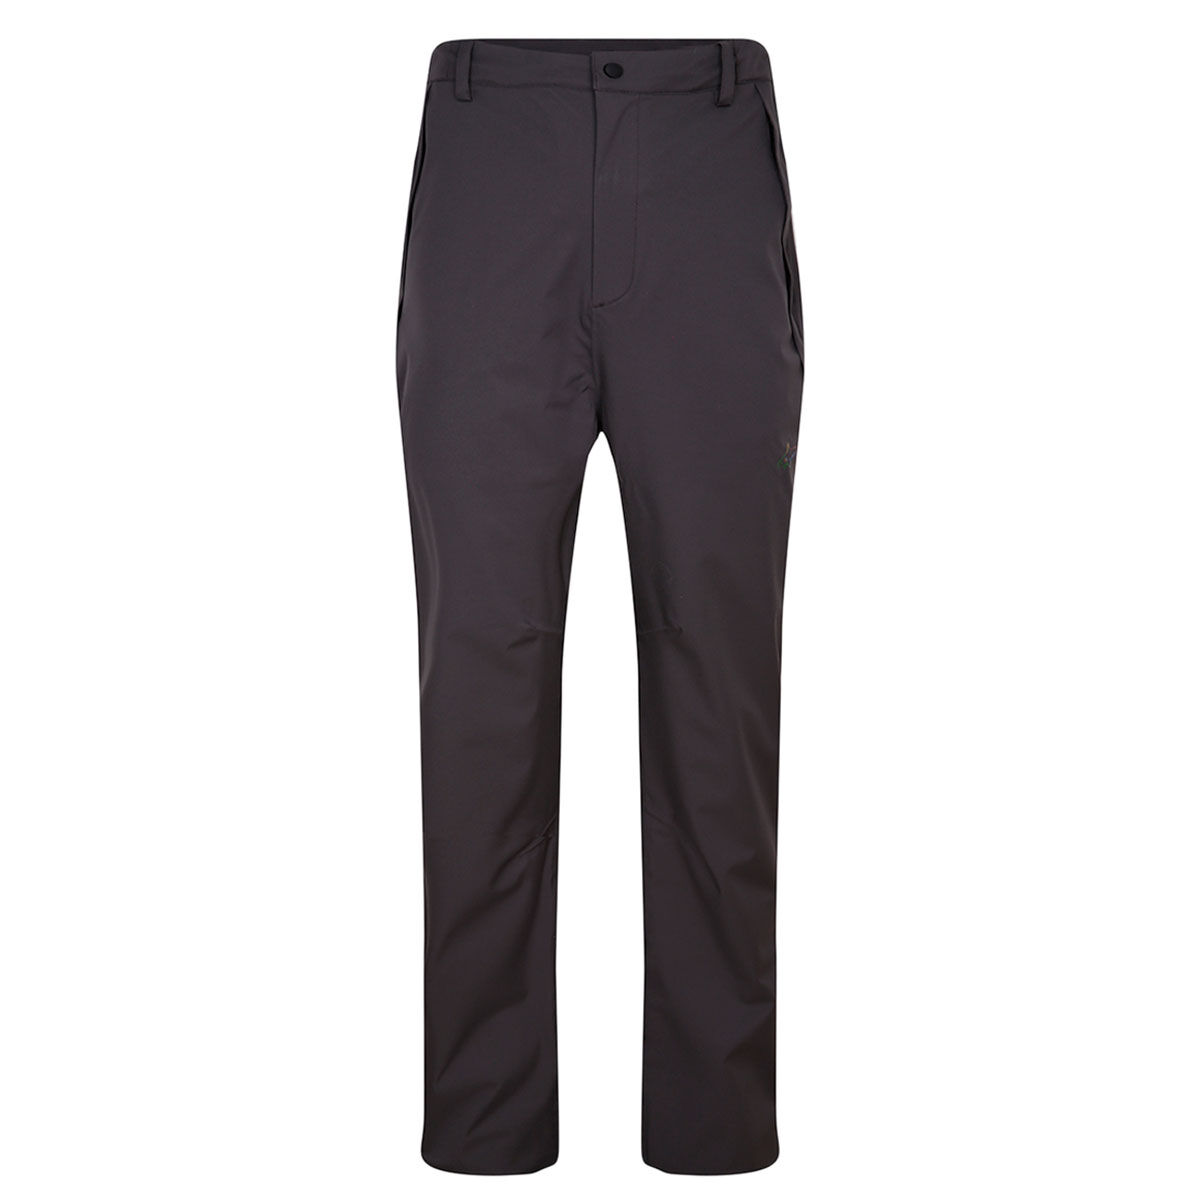 Greg Norman Dorsal Waterproof Golf Trousers, Mens, Charcoal, Large   American Golf